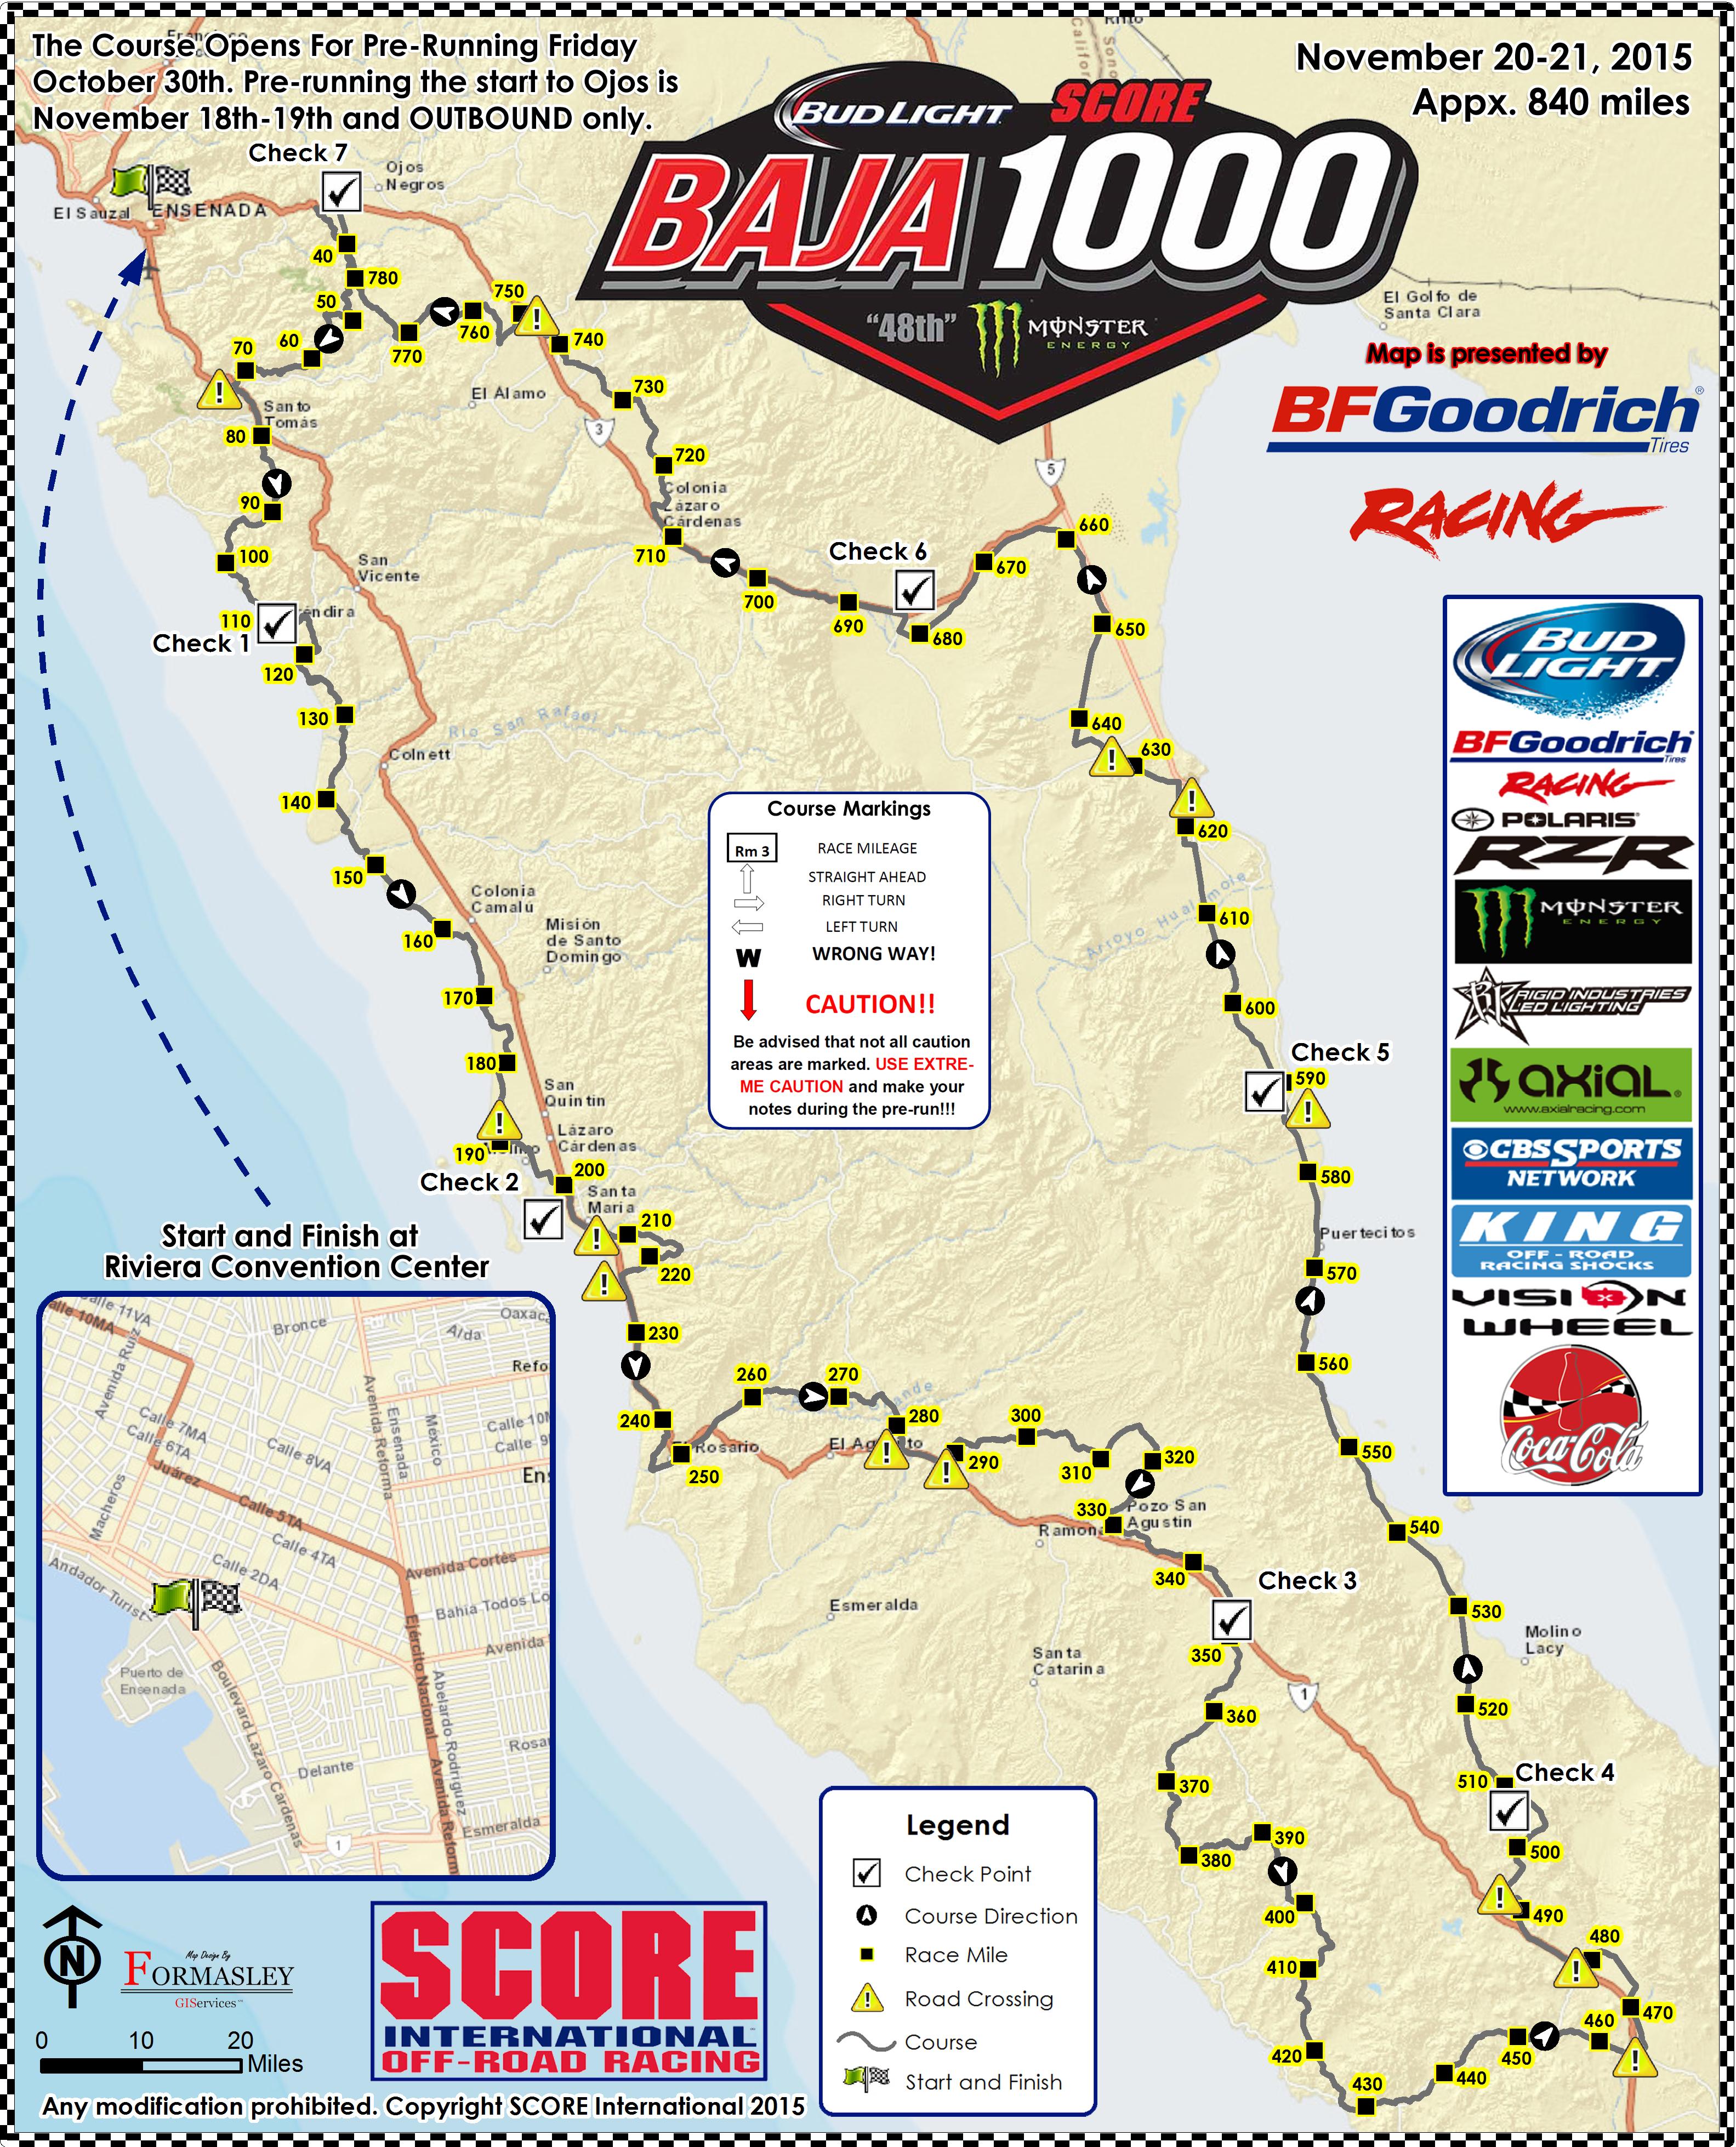 Baja 1000 Map Baja 1000 Course Map | SCORE International.com